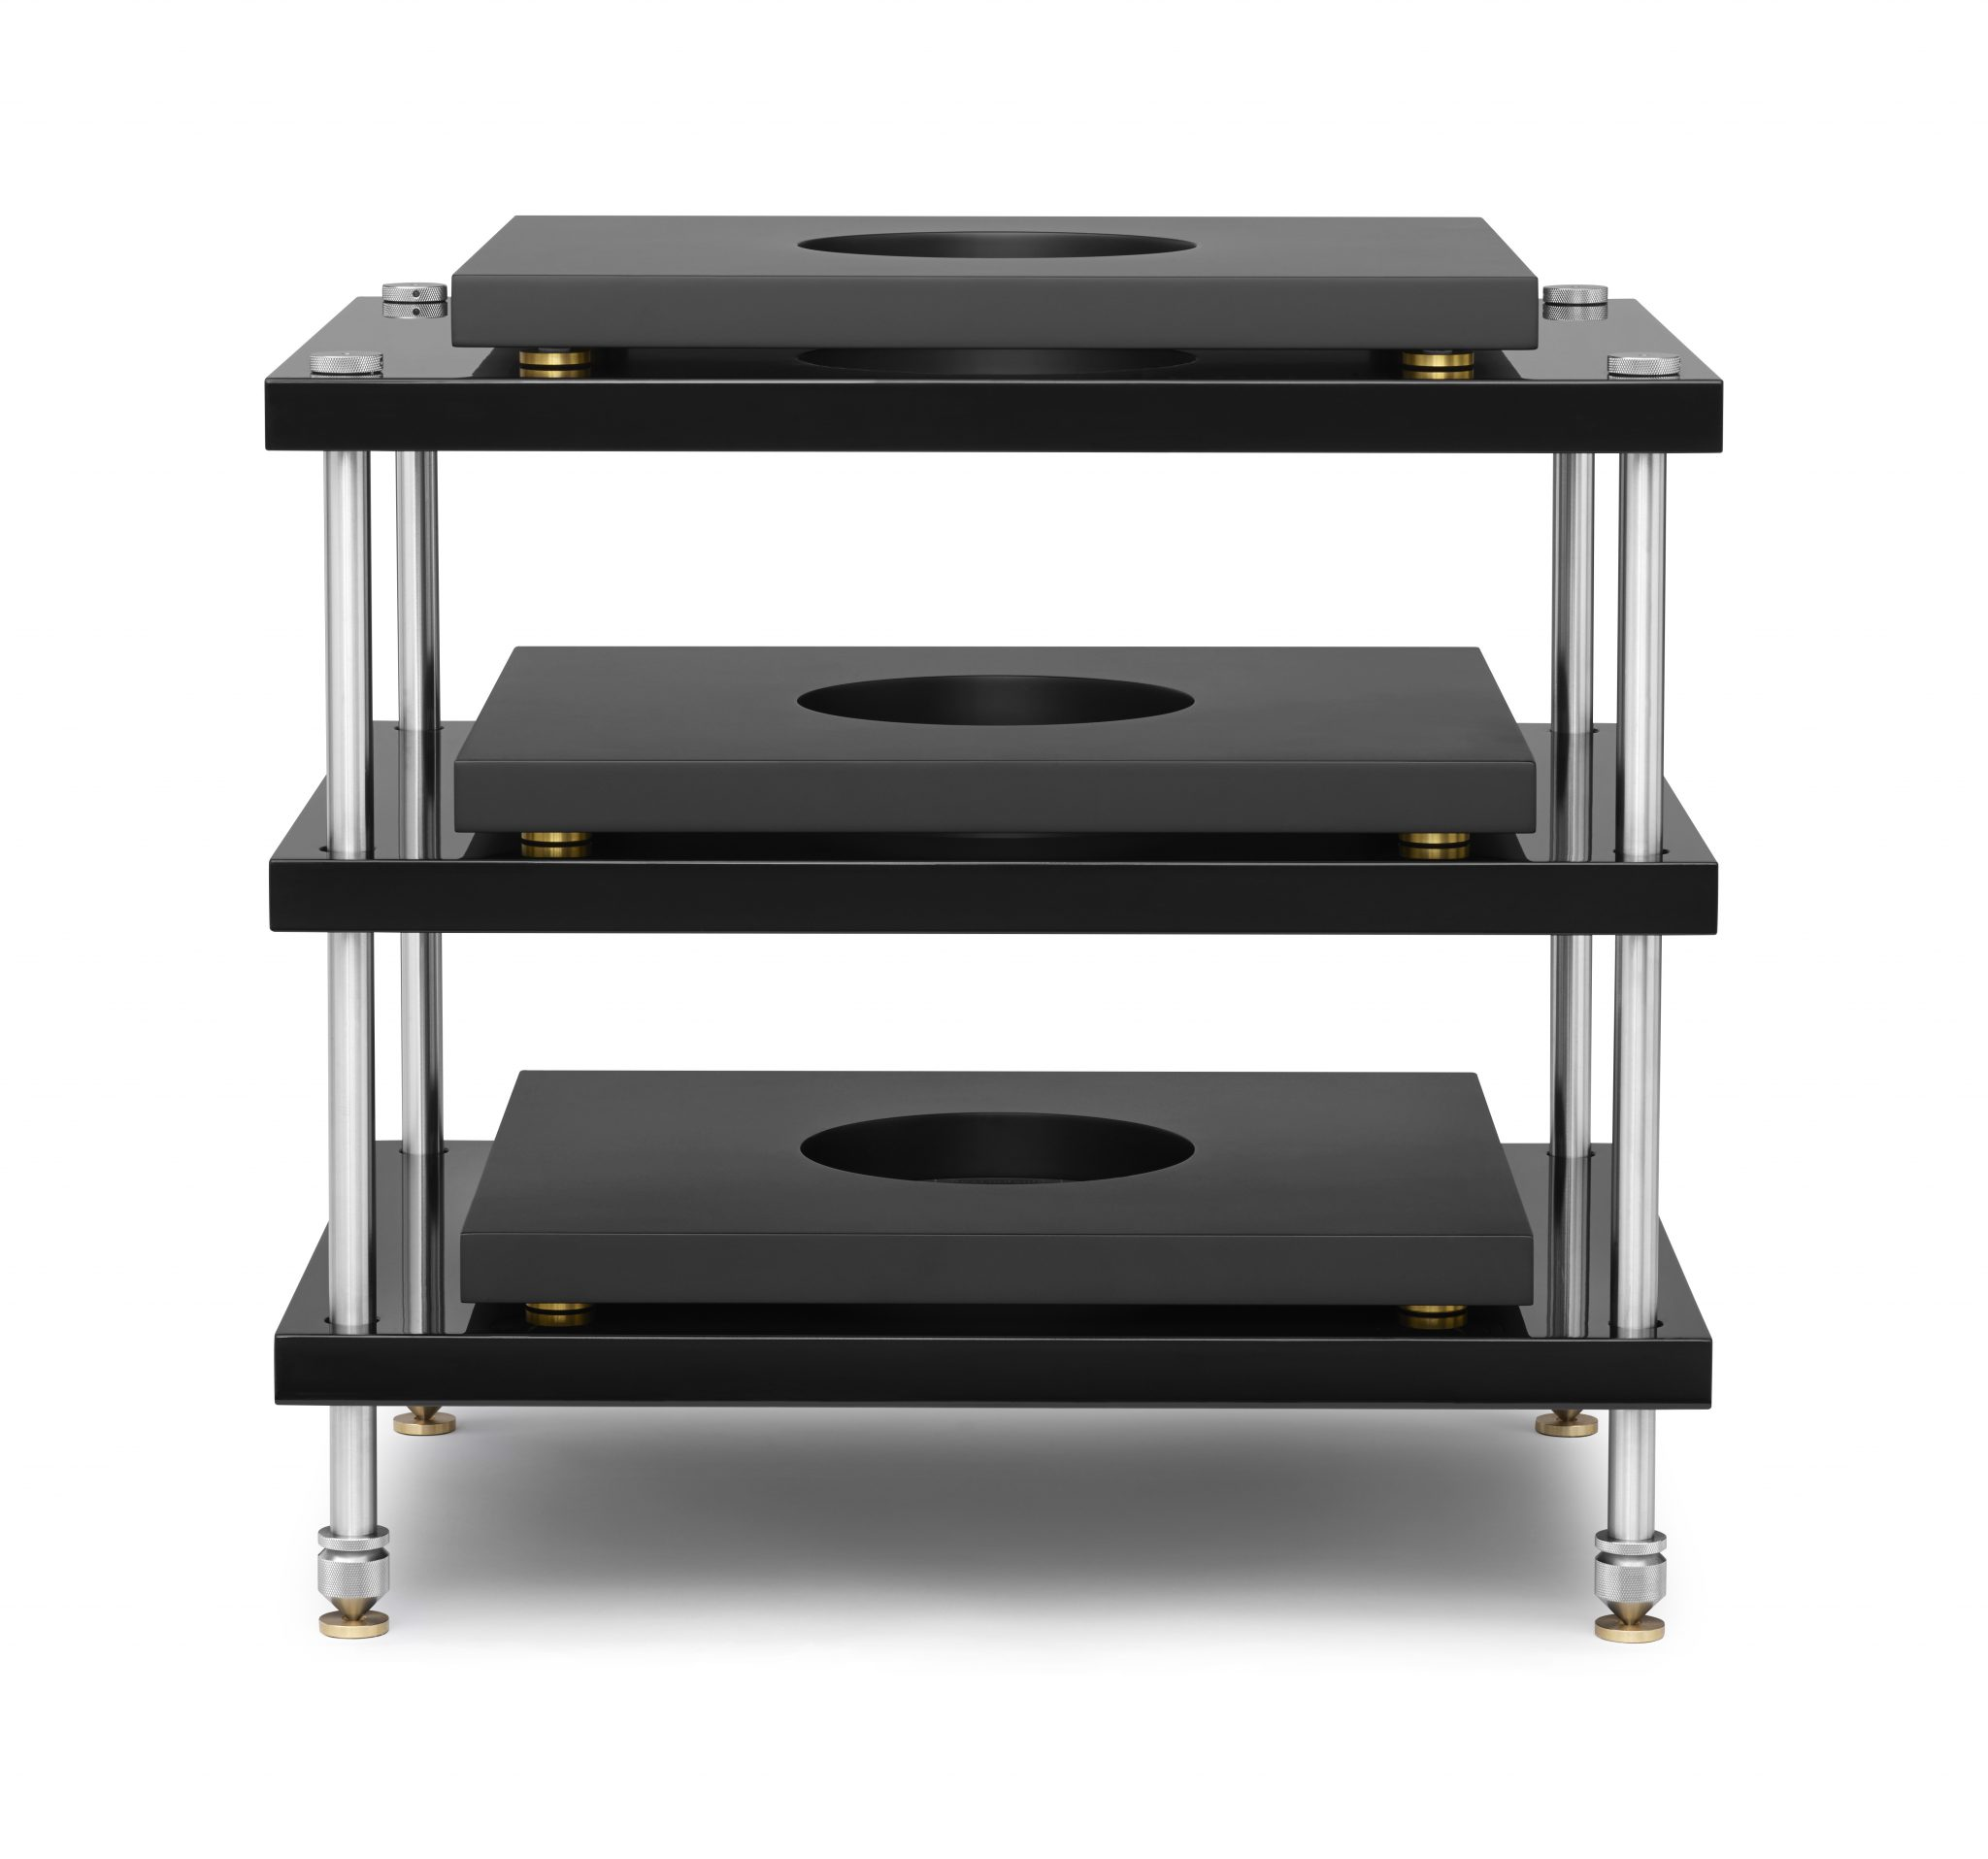 systems stand harmonic audio rack racks features menu resolution vxr